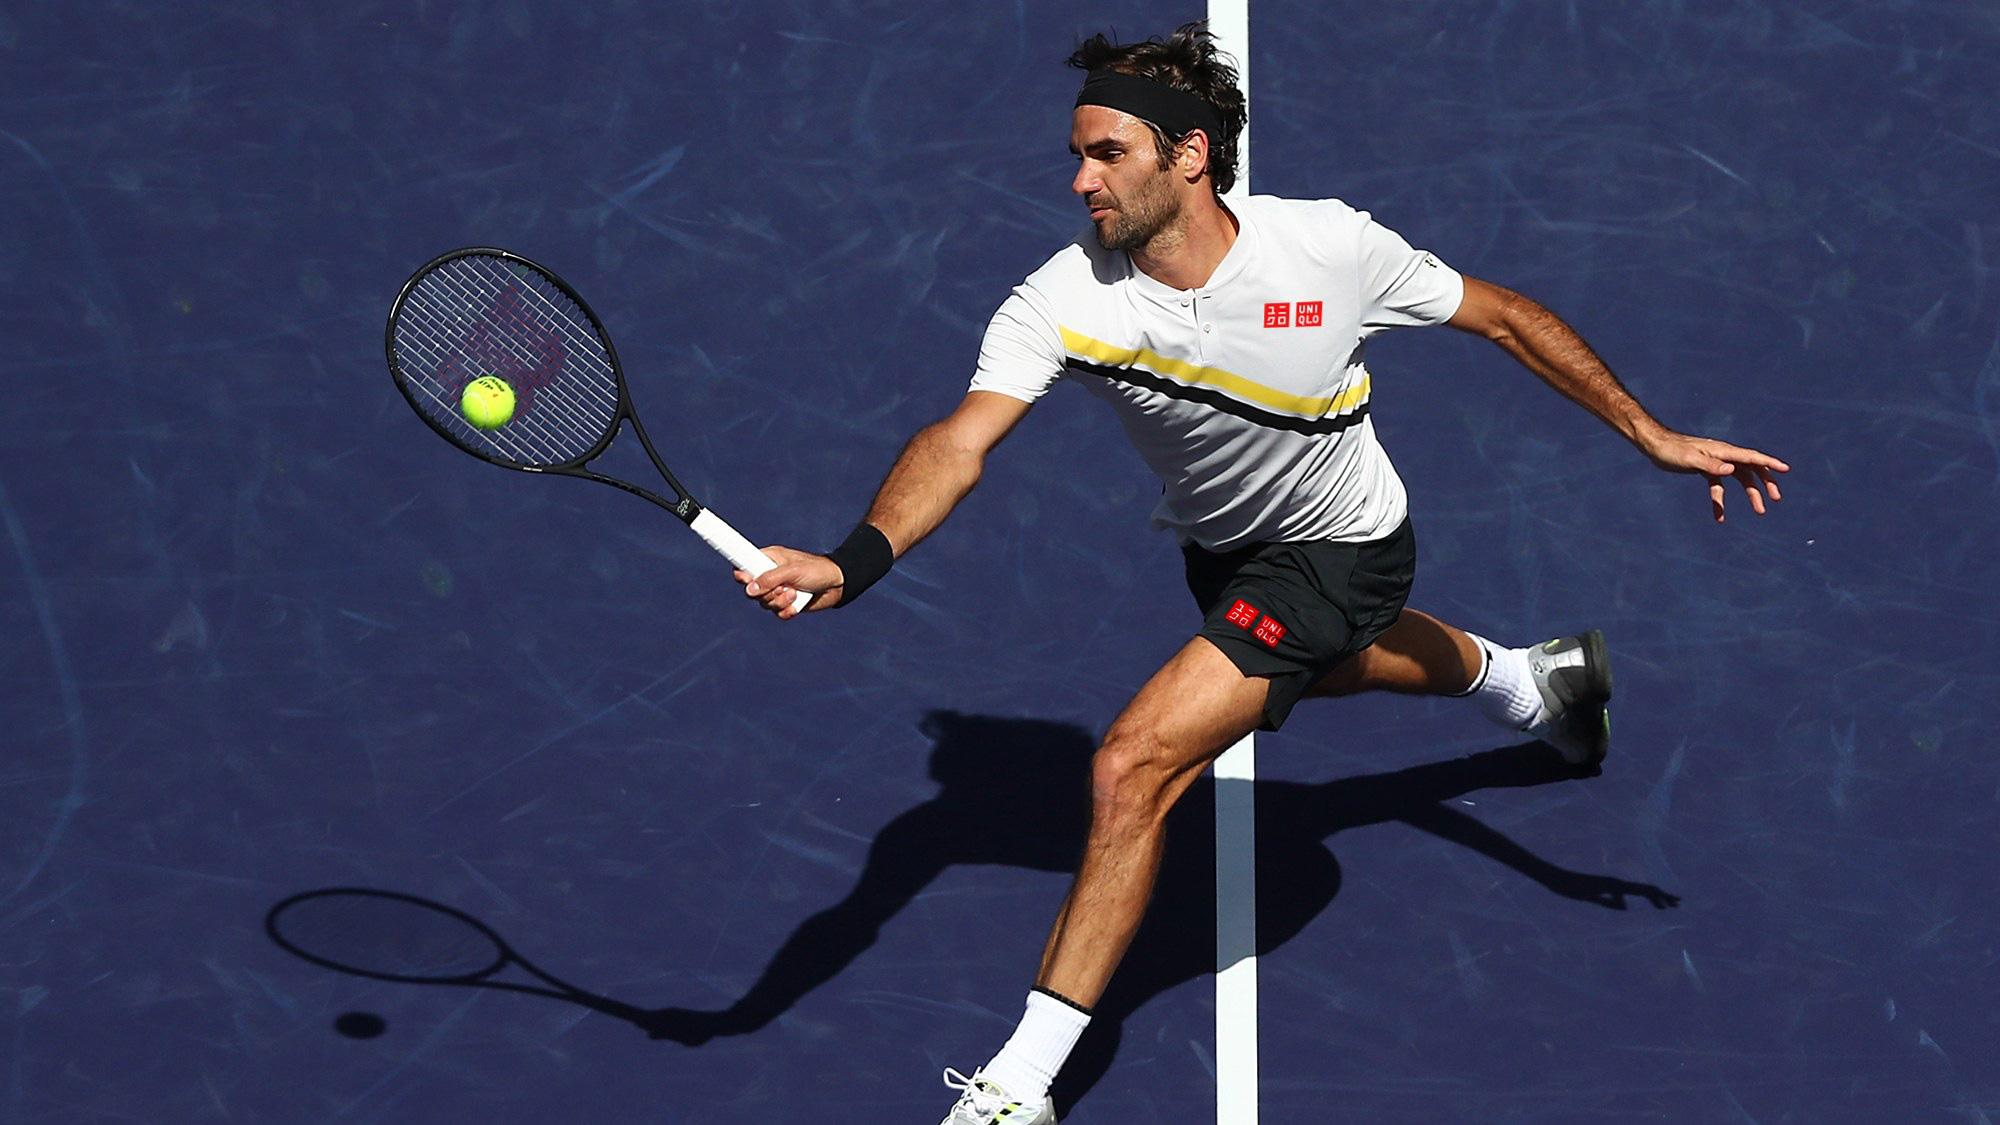 Roger Federer - Huyền thoại sống